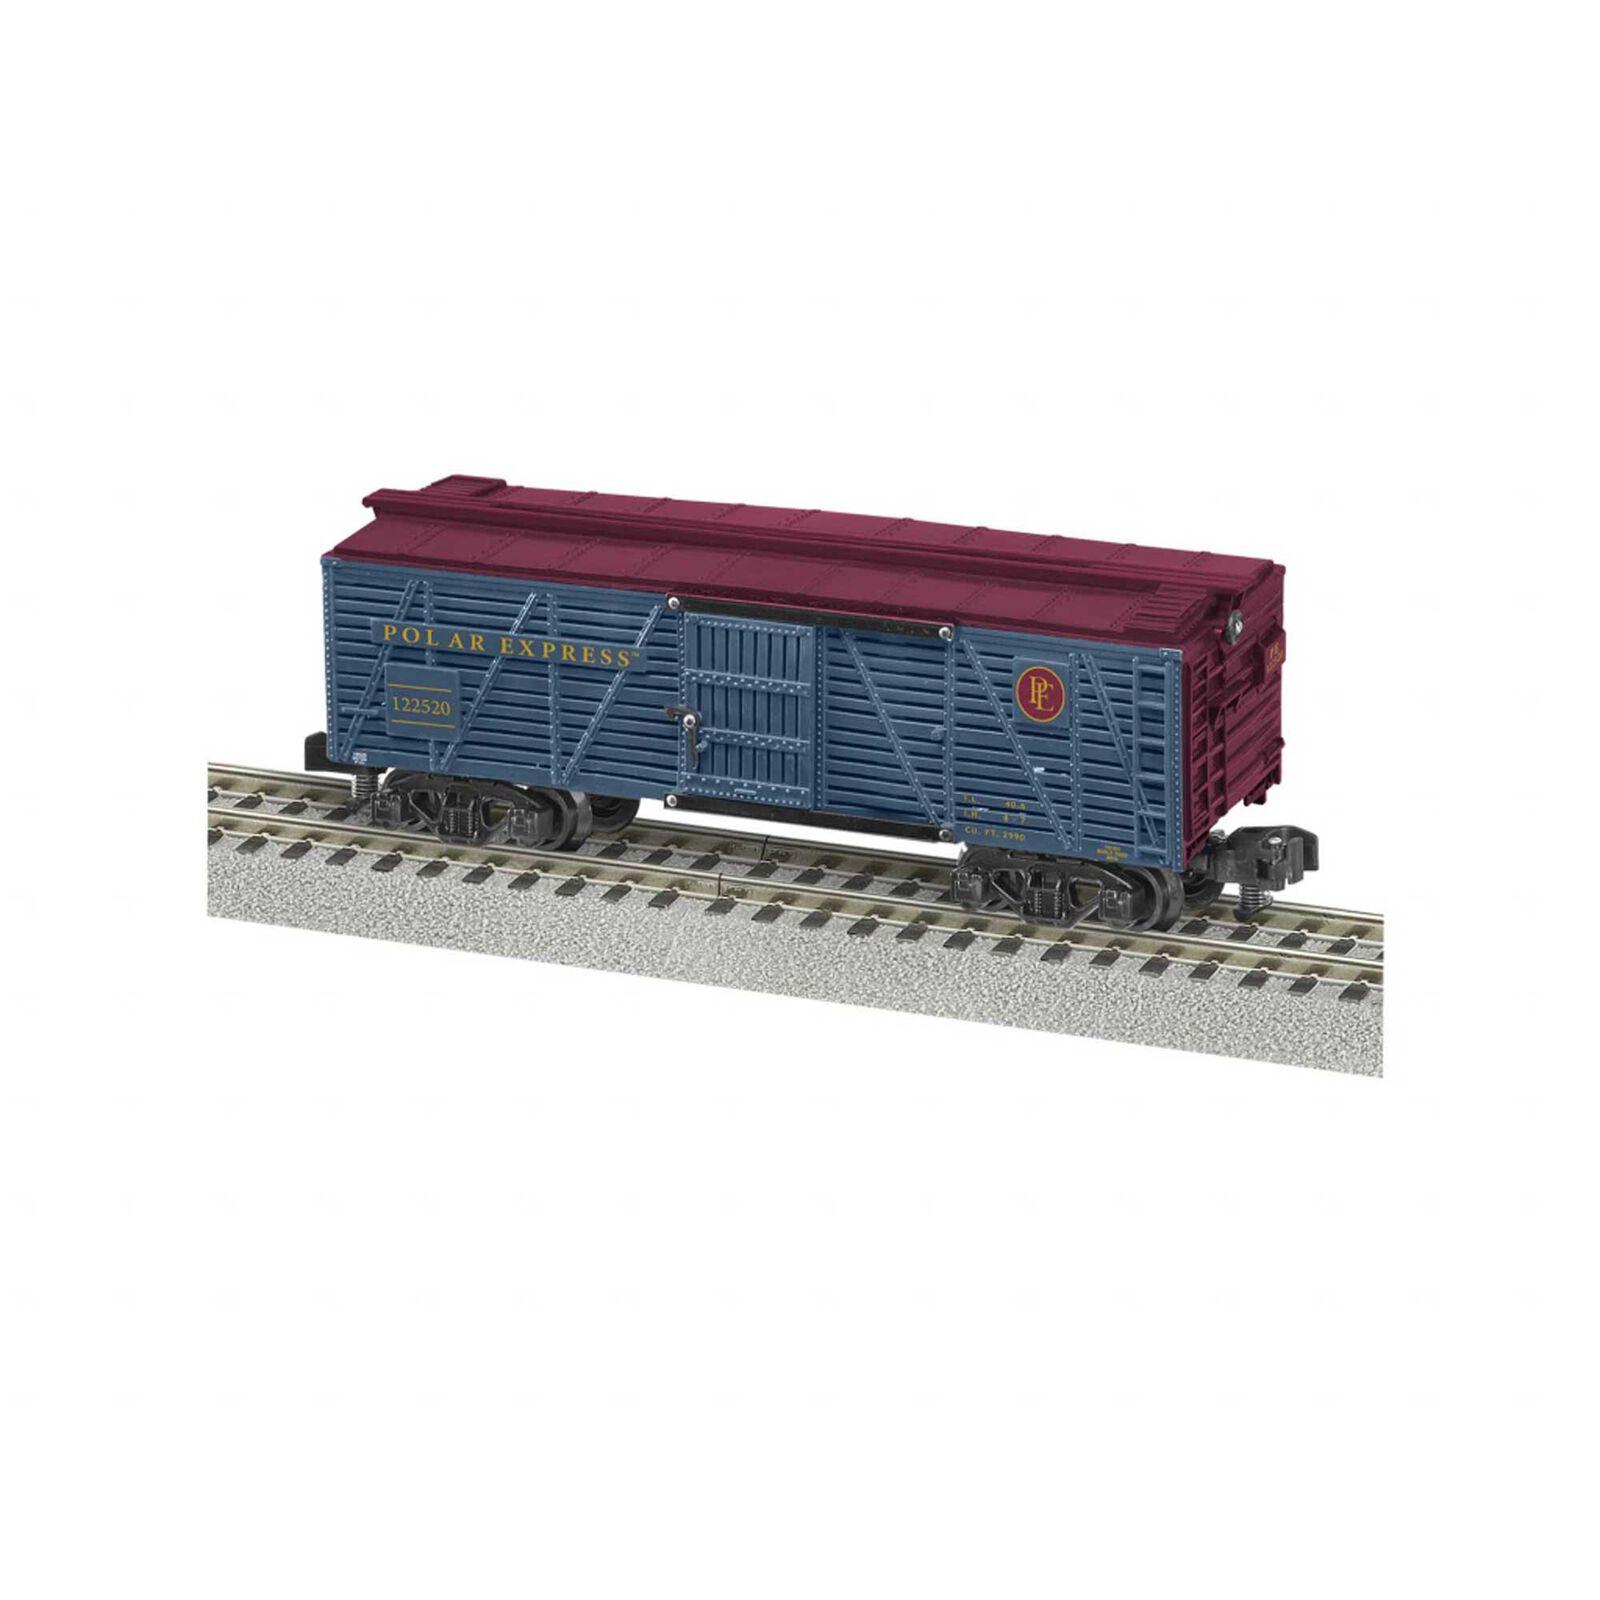 S The Polar Express Stock Car #122520